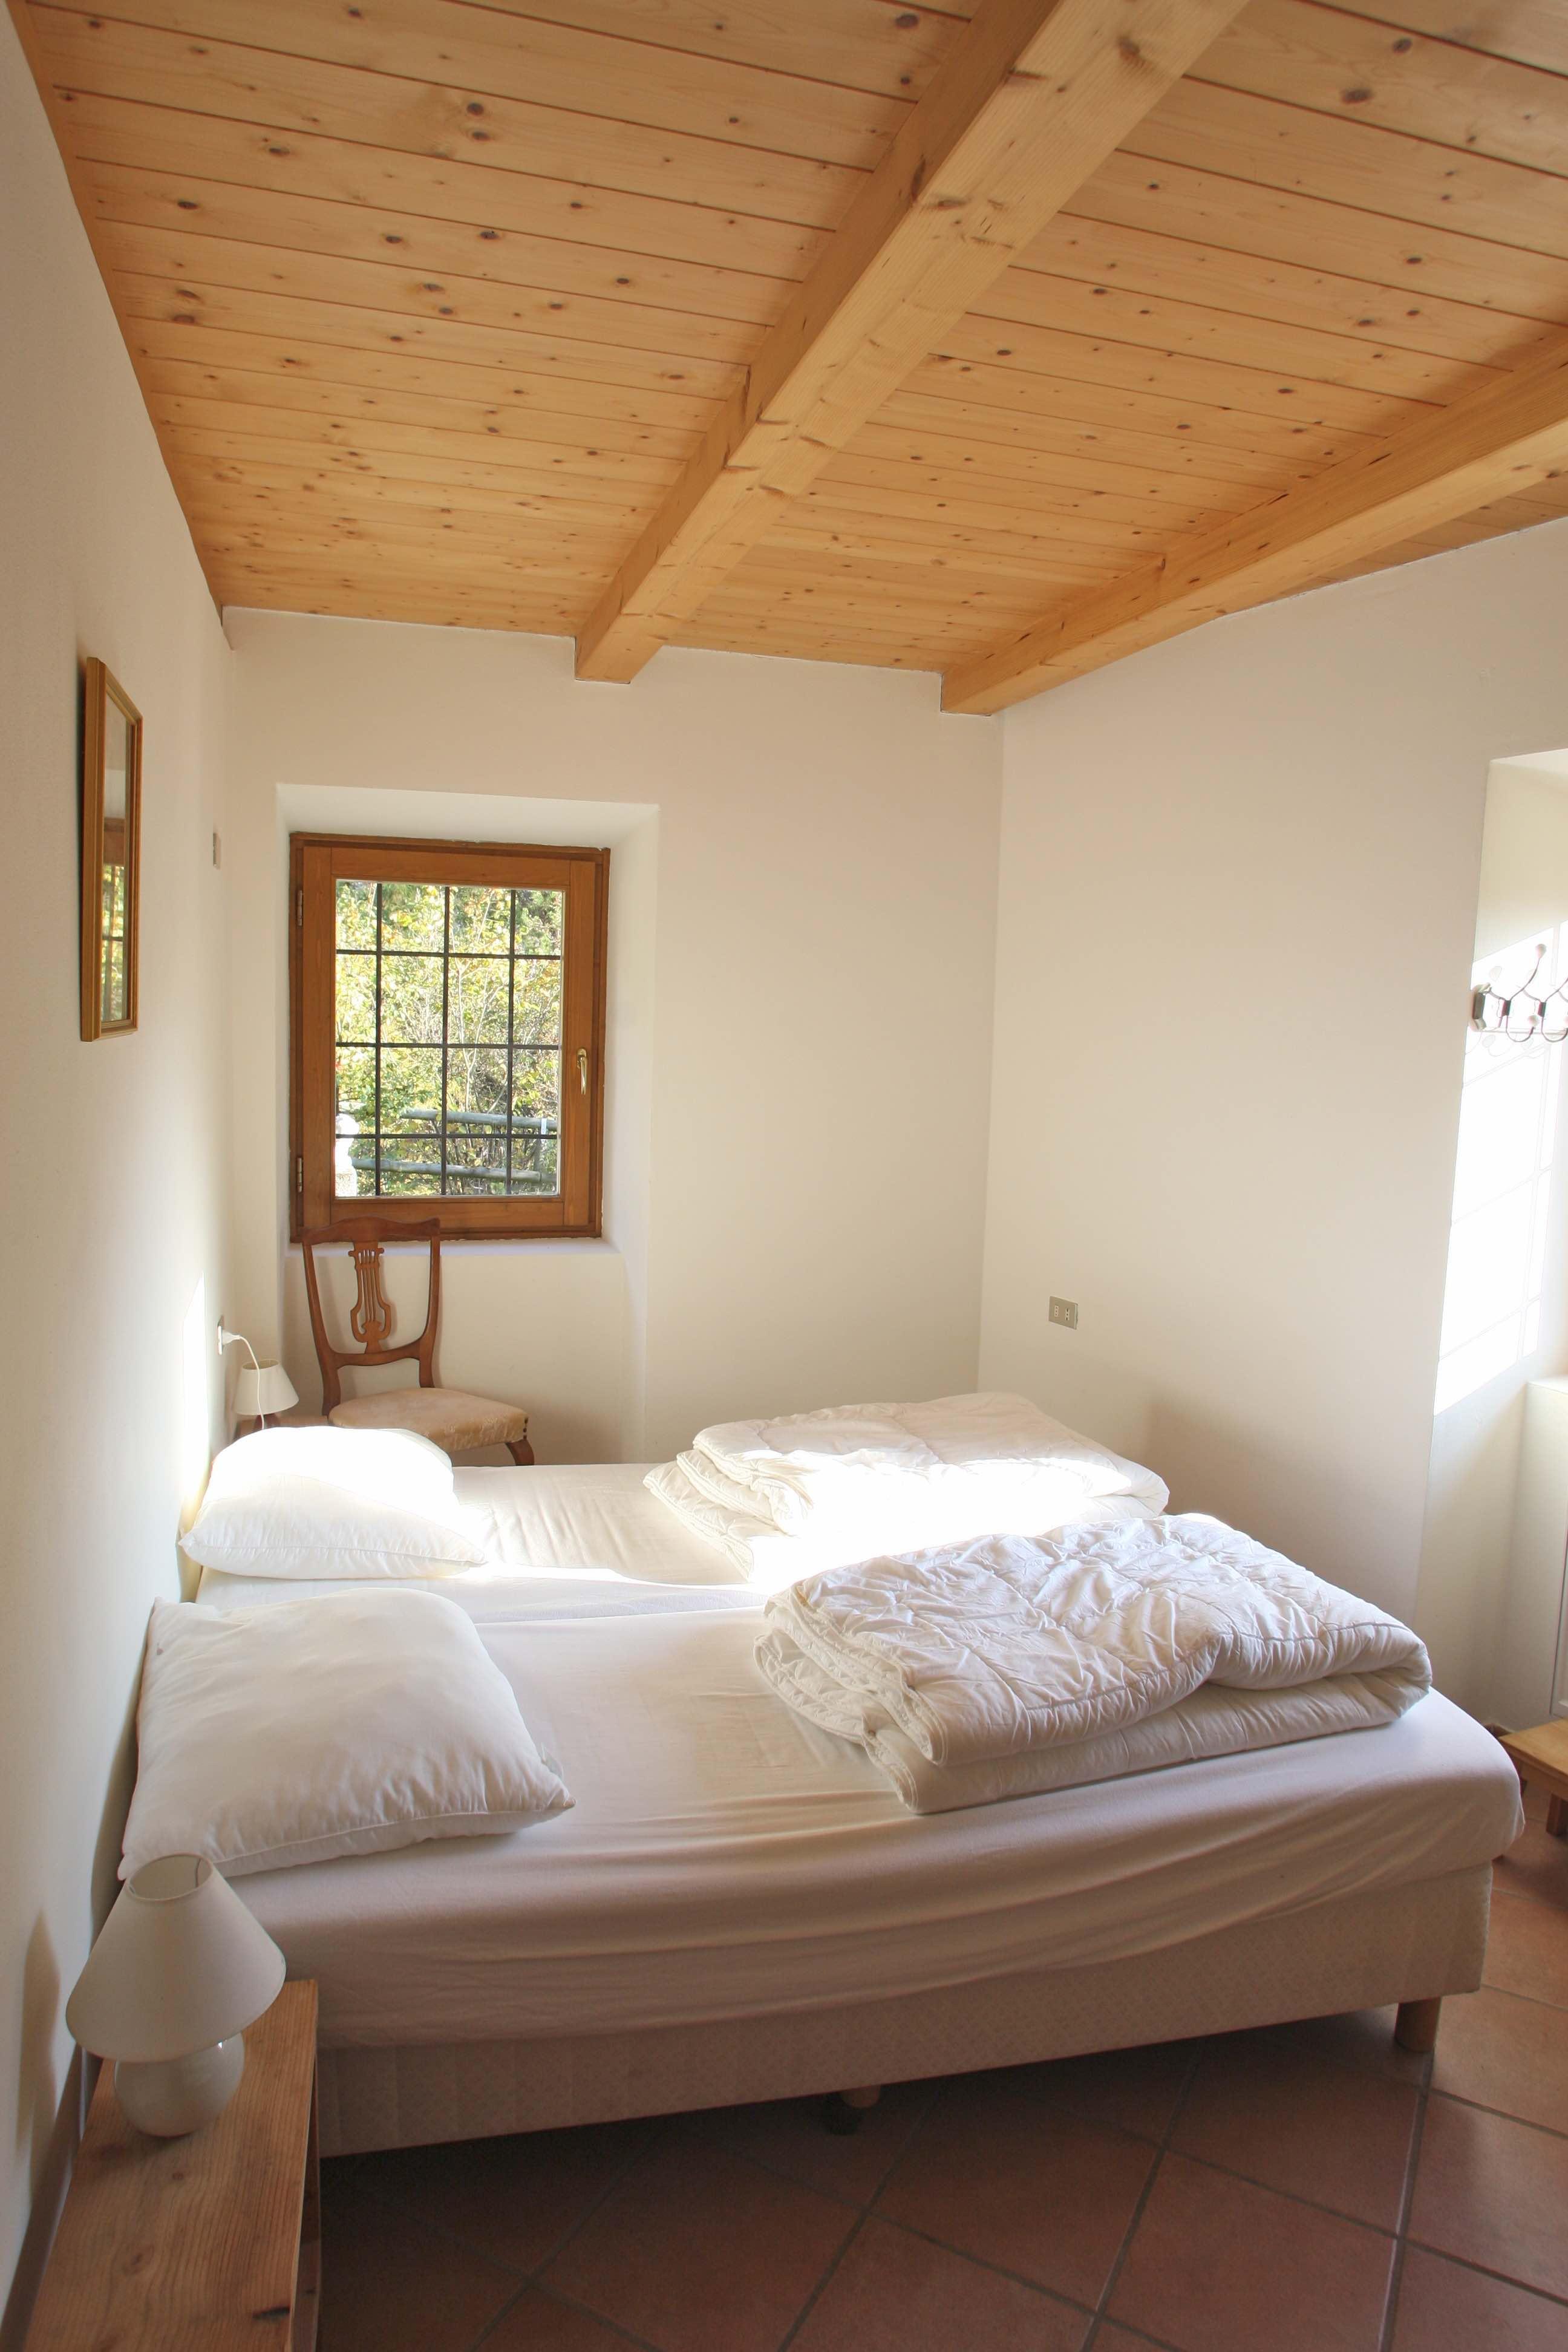 Slaapkamer 4 pers